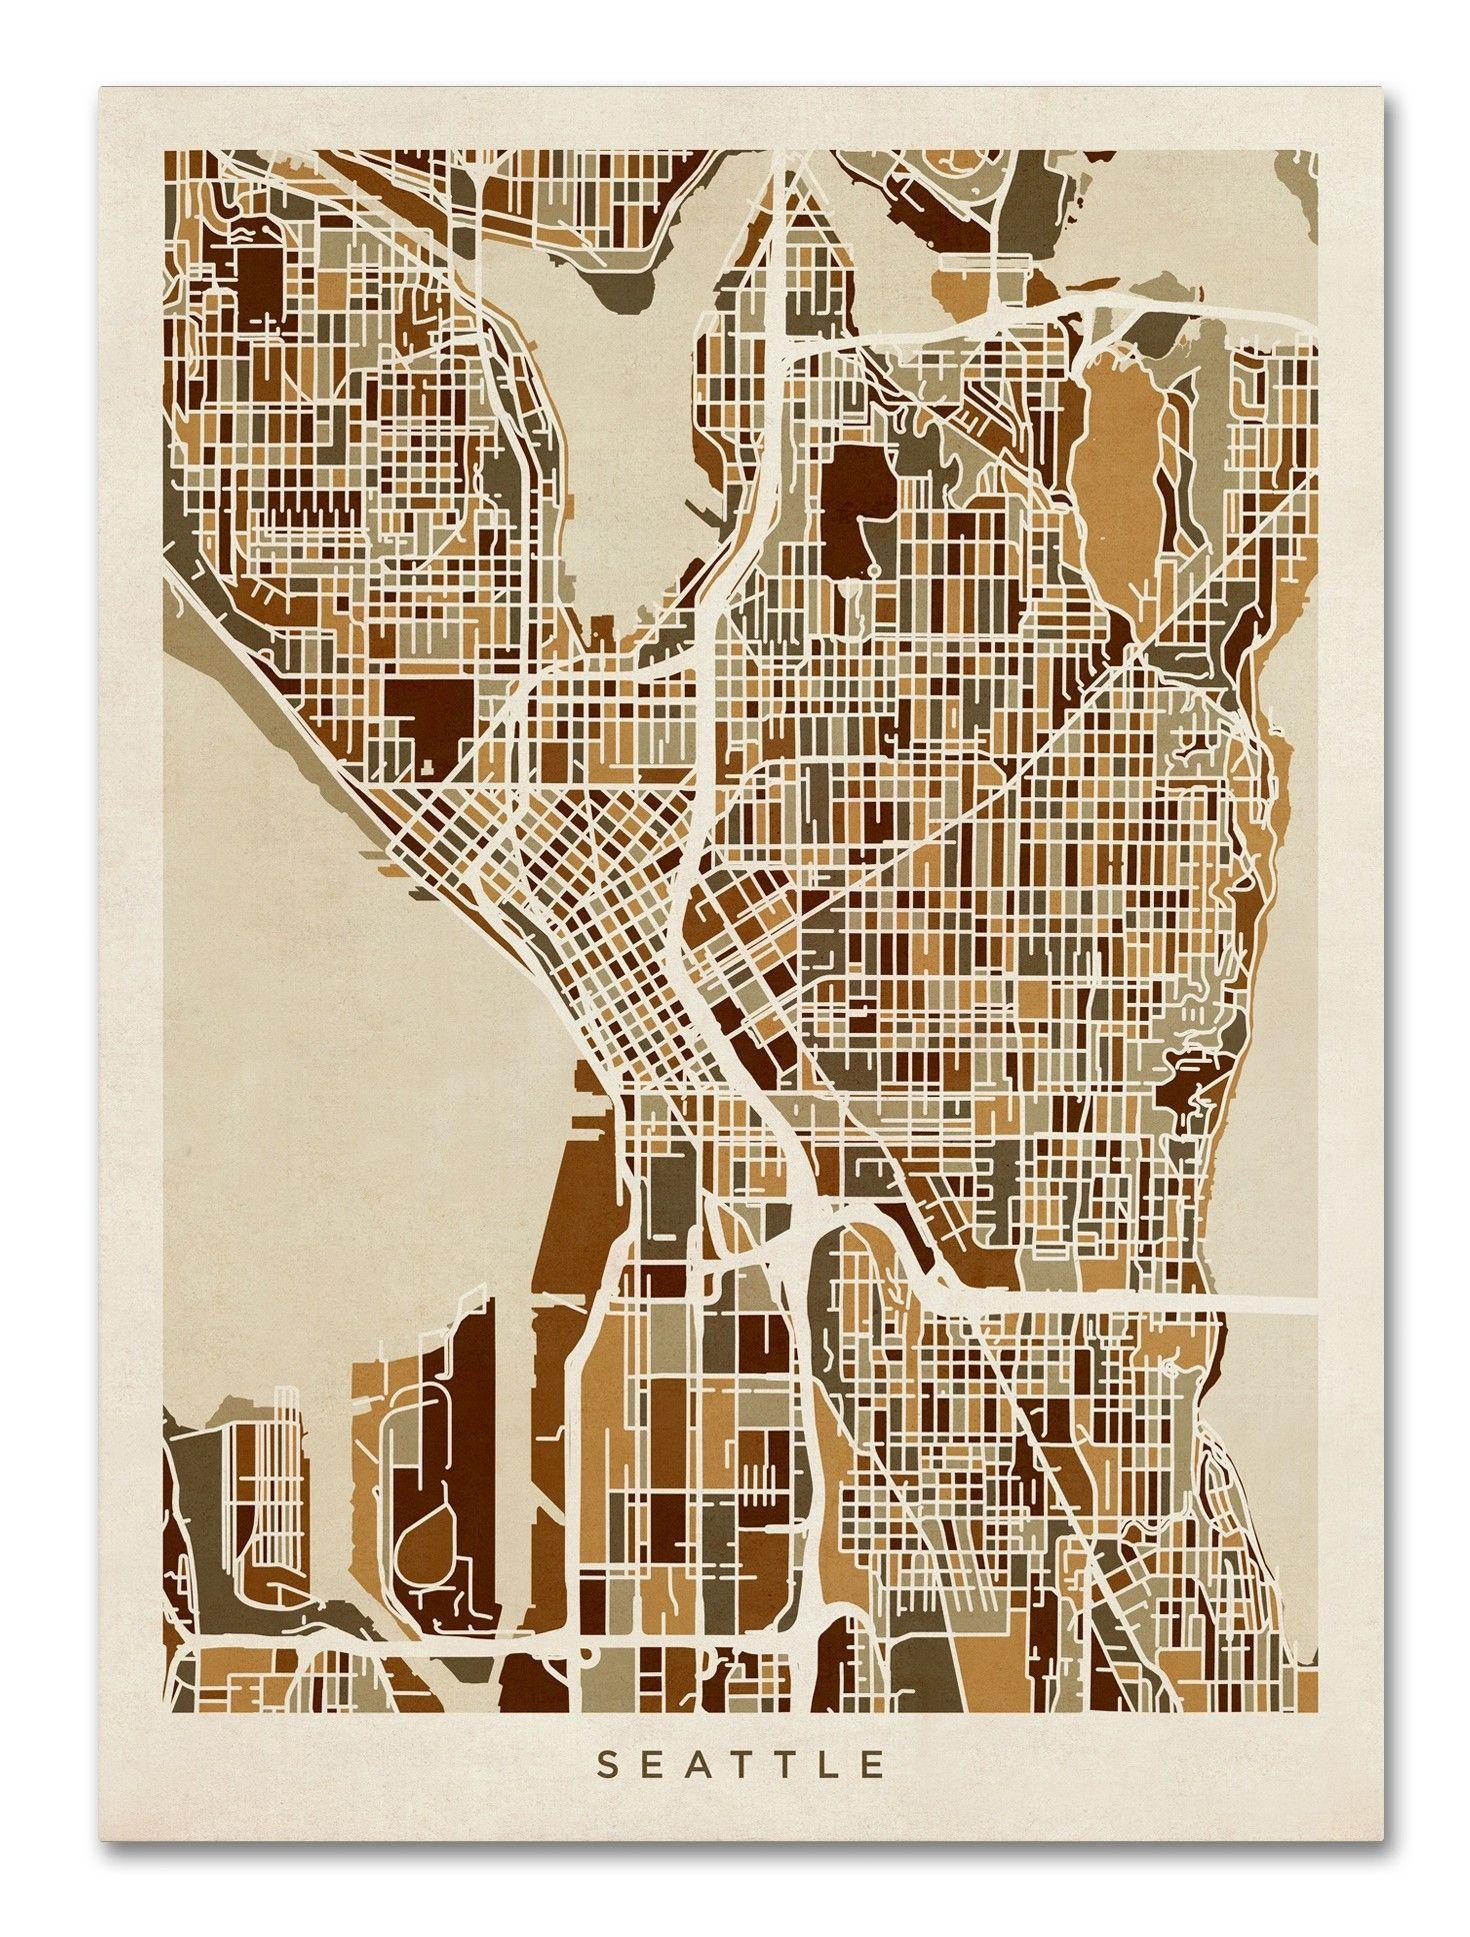 Seattle Washington Street Map Graphic Art On Wrapped Canvas Street Map Art Map Art Print Seattle Map